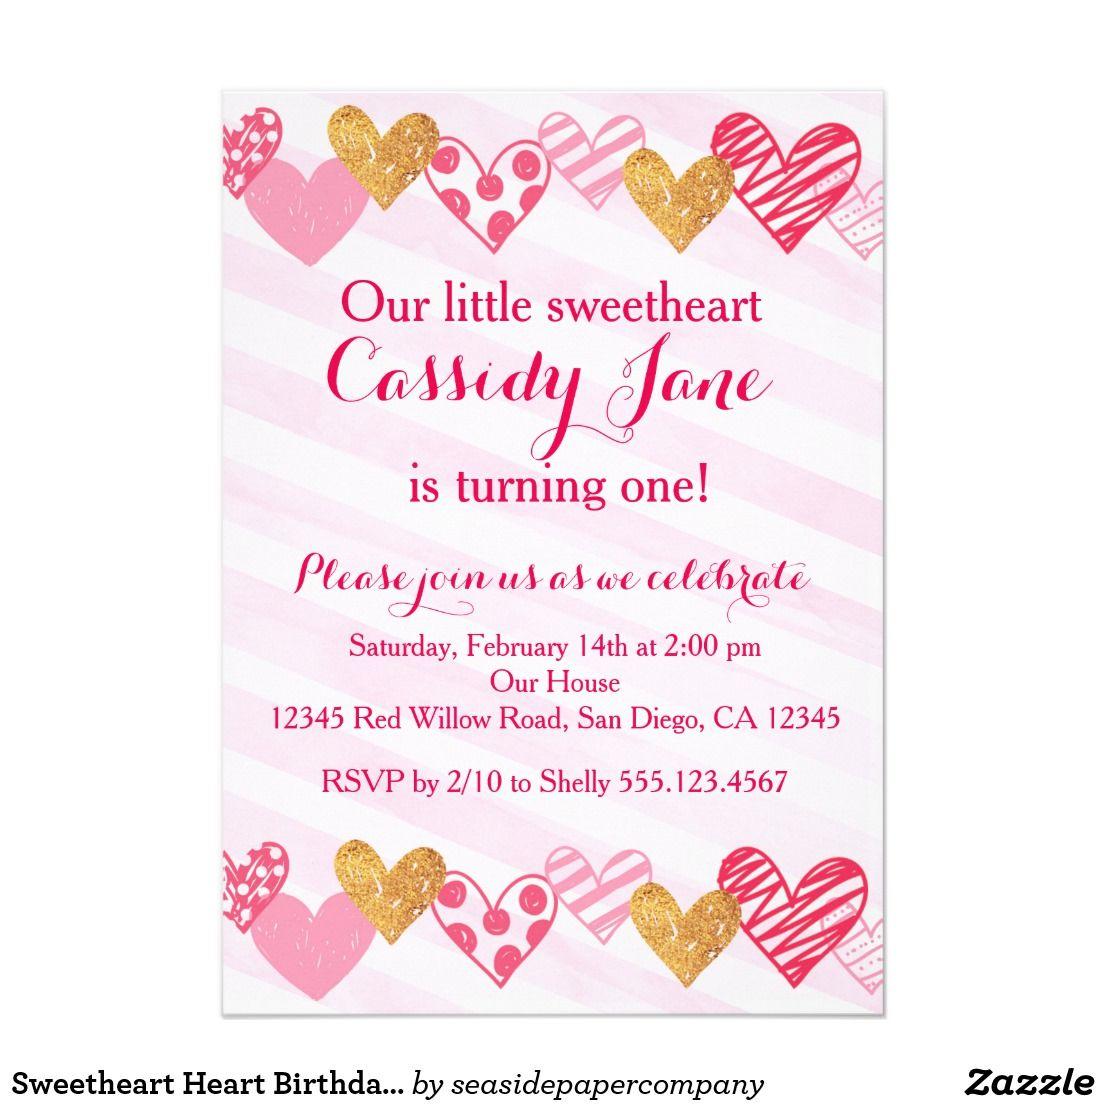 Sweetheart Heart Birthday Invitation Birthdays